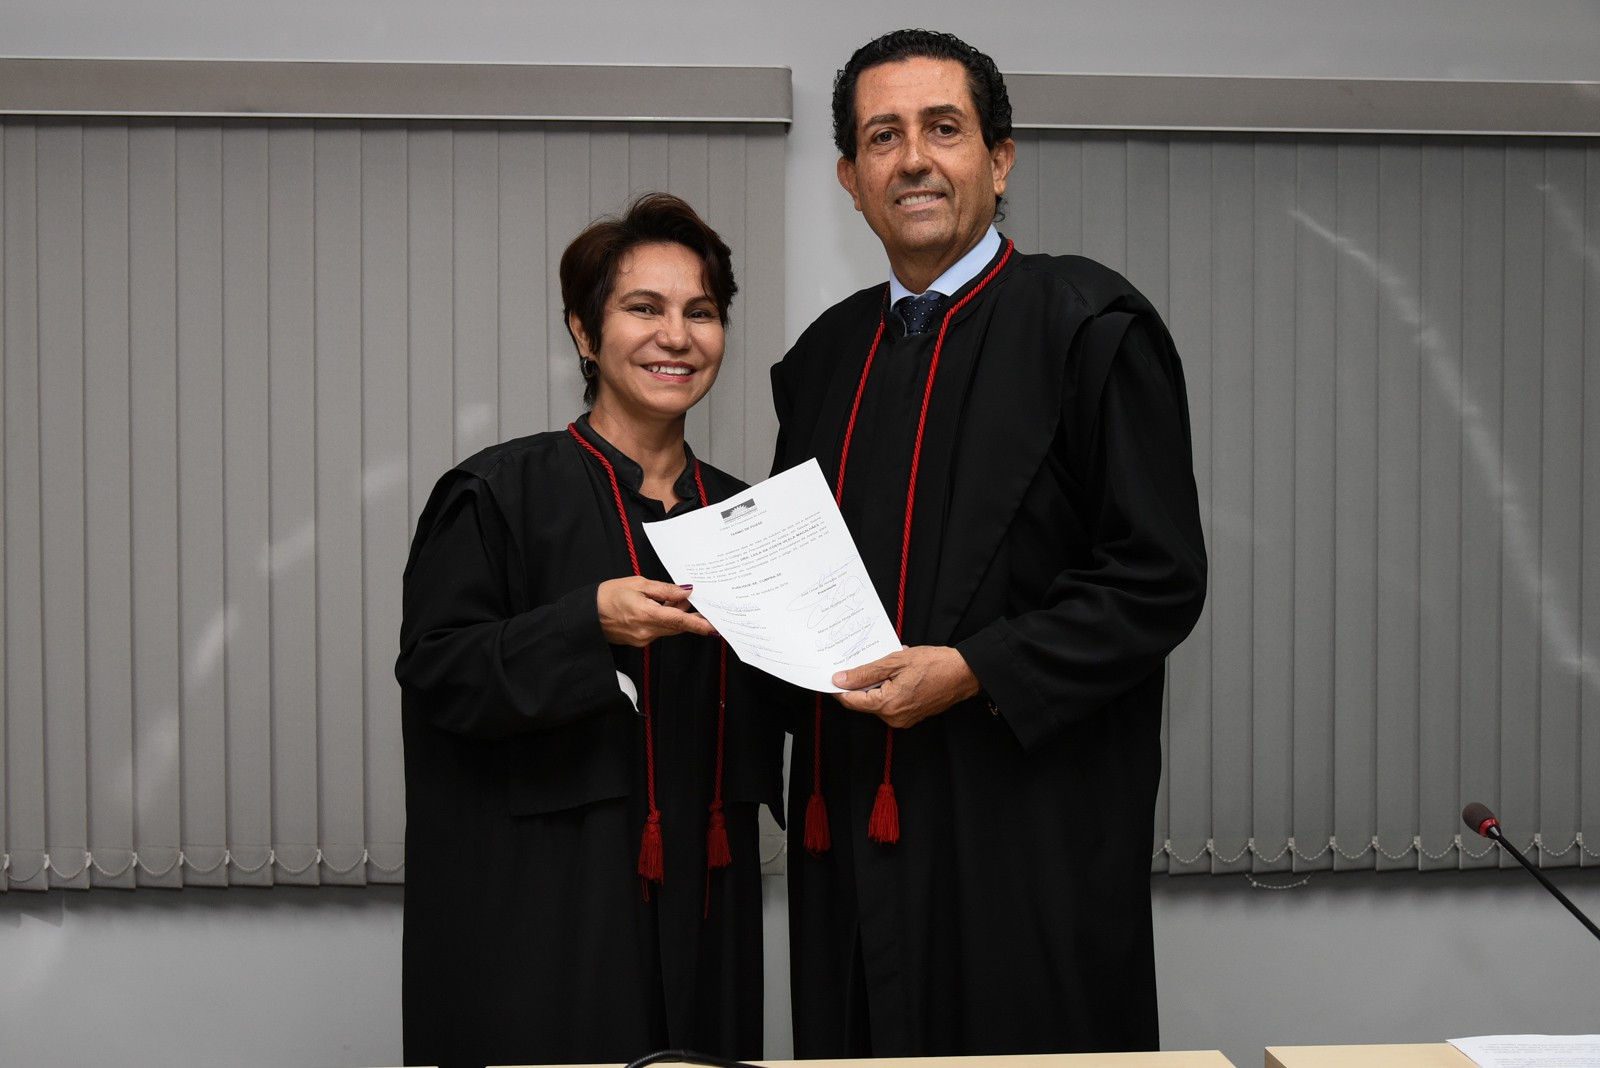 Leila da Costa Vilela é reeleita Ouvidora do MPTO para o biênio 2019/2020